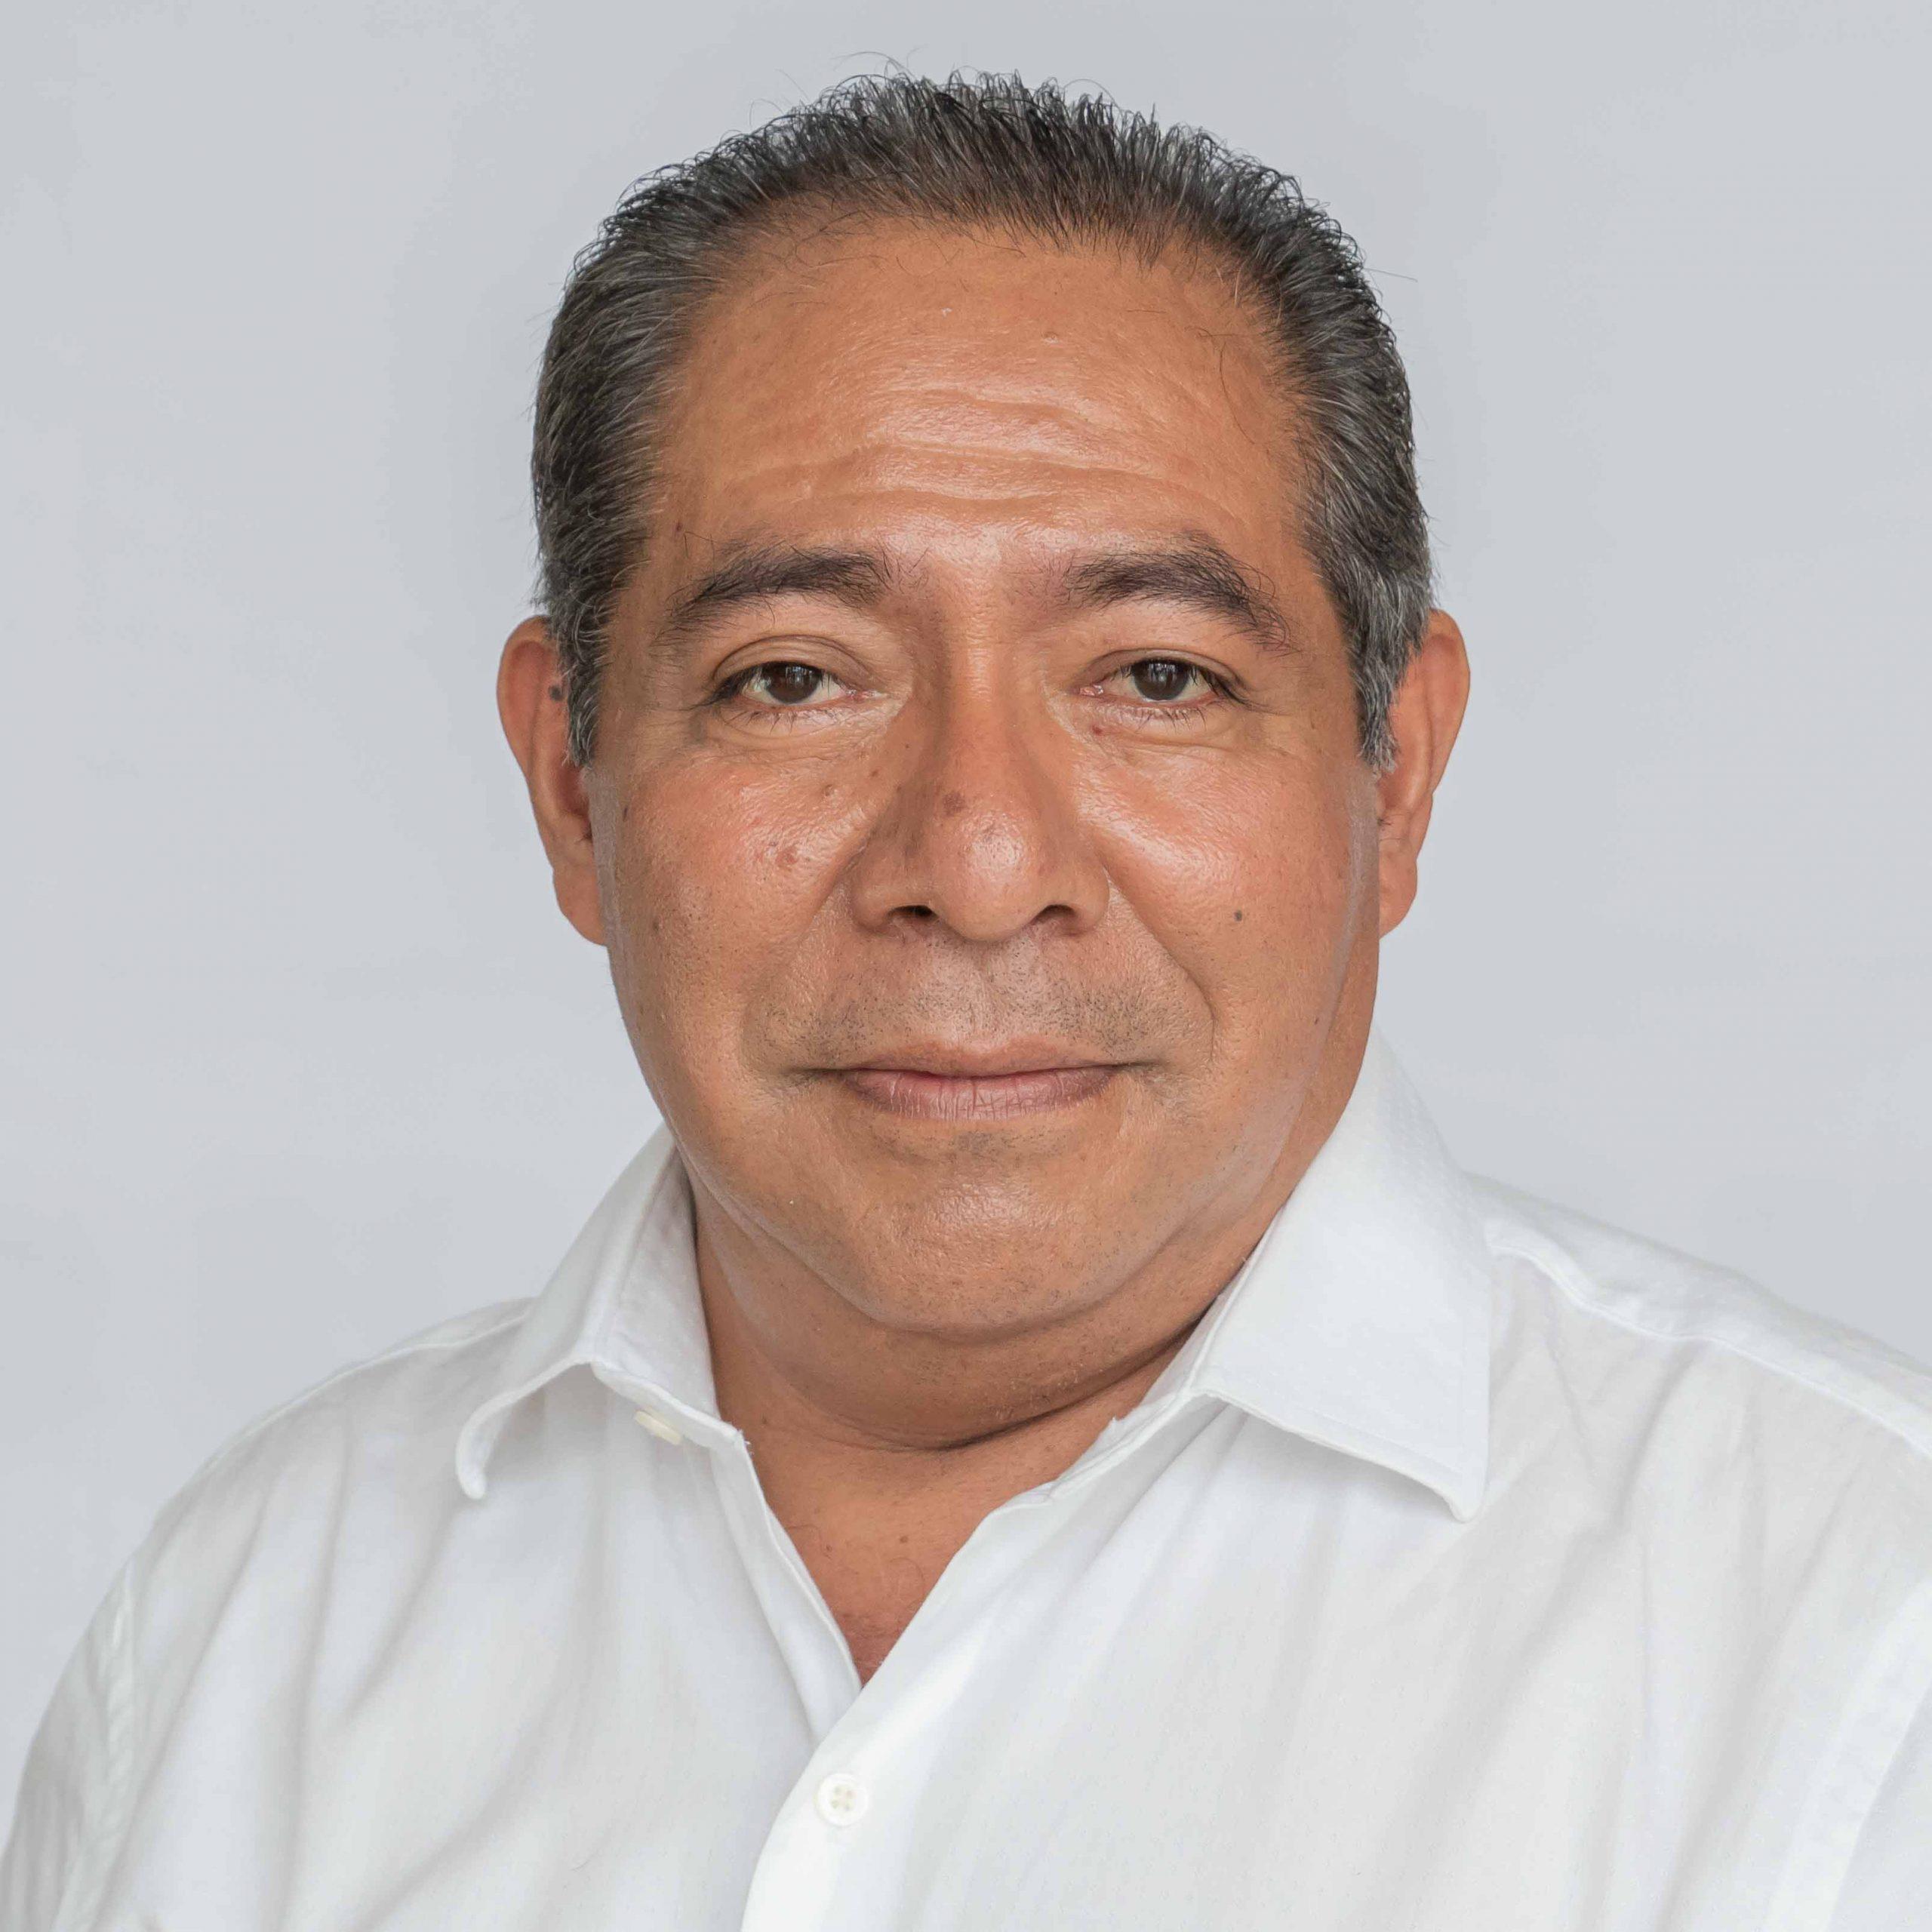 https://congresogro.gob.mx/63/inicio/wp-content/uploads/2021/09/raymundo-garcia-scaled.jpg